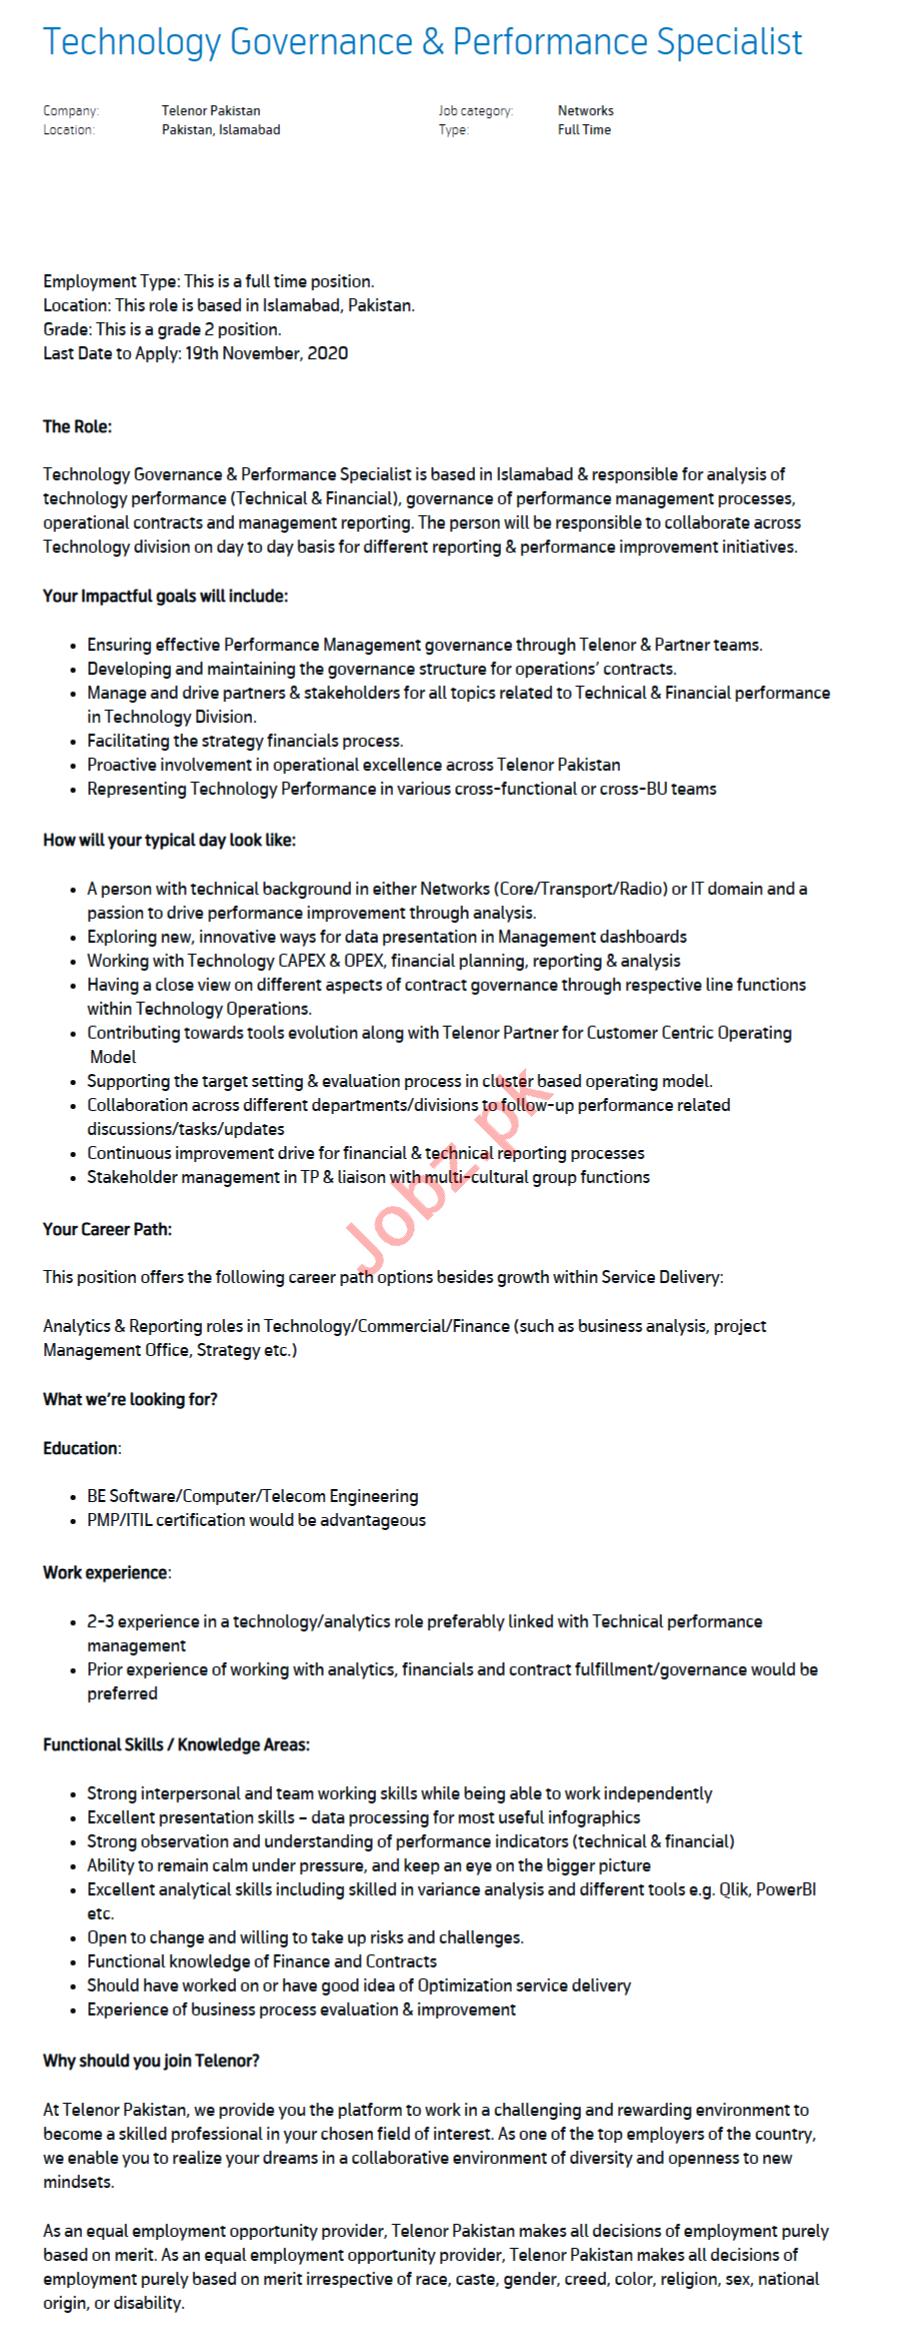 Technology Governance & Performance Specialist Jobs 2020